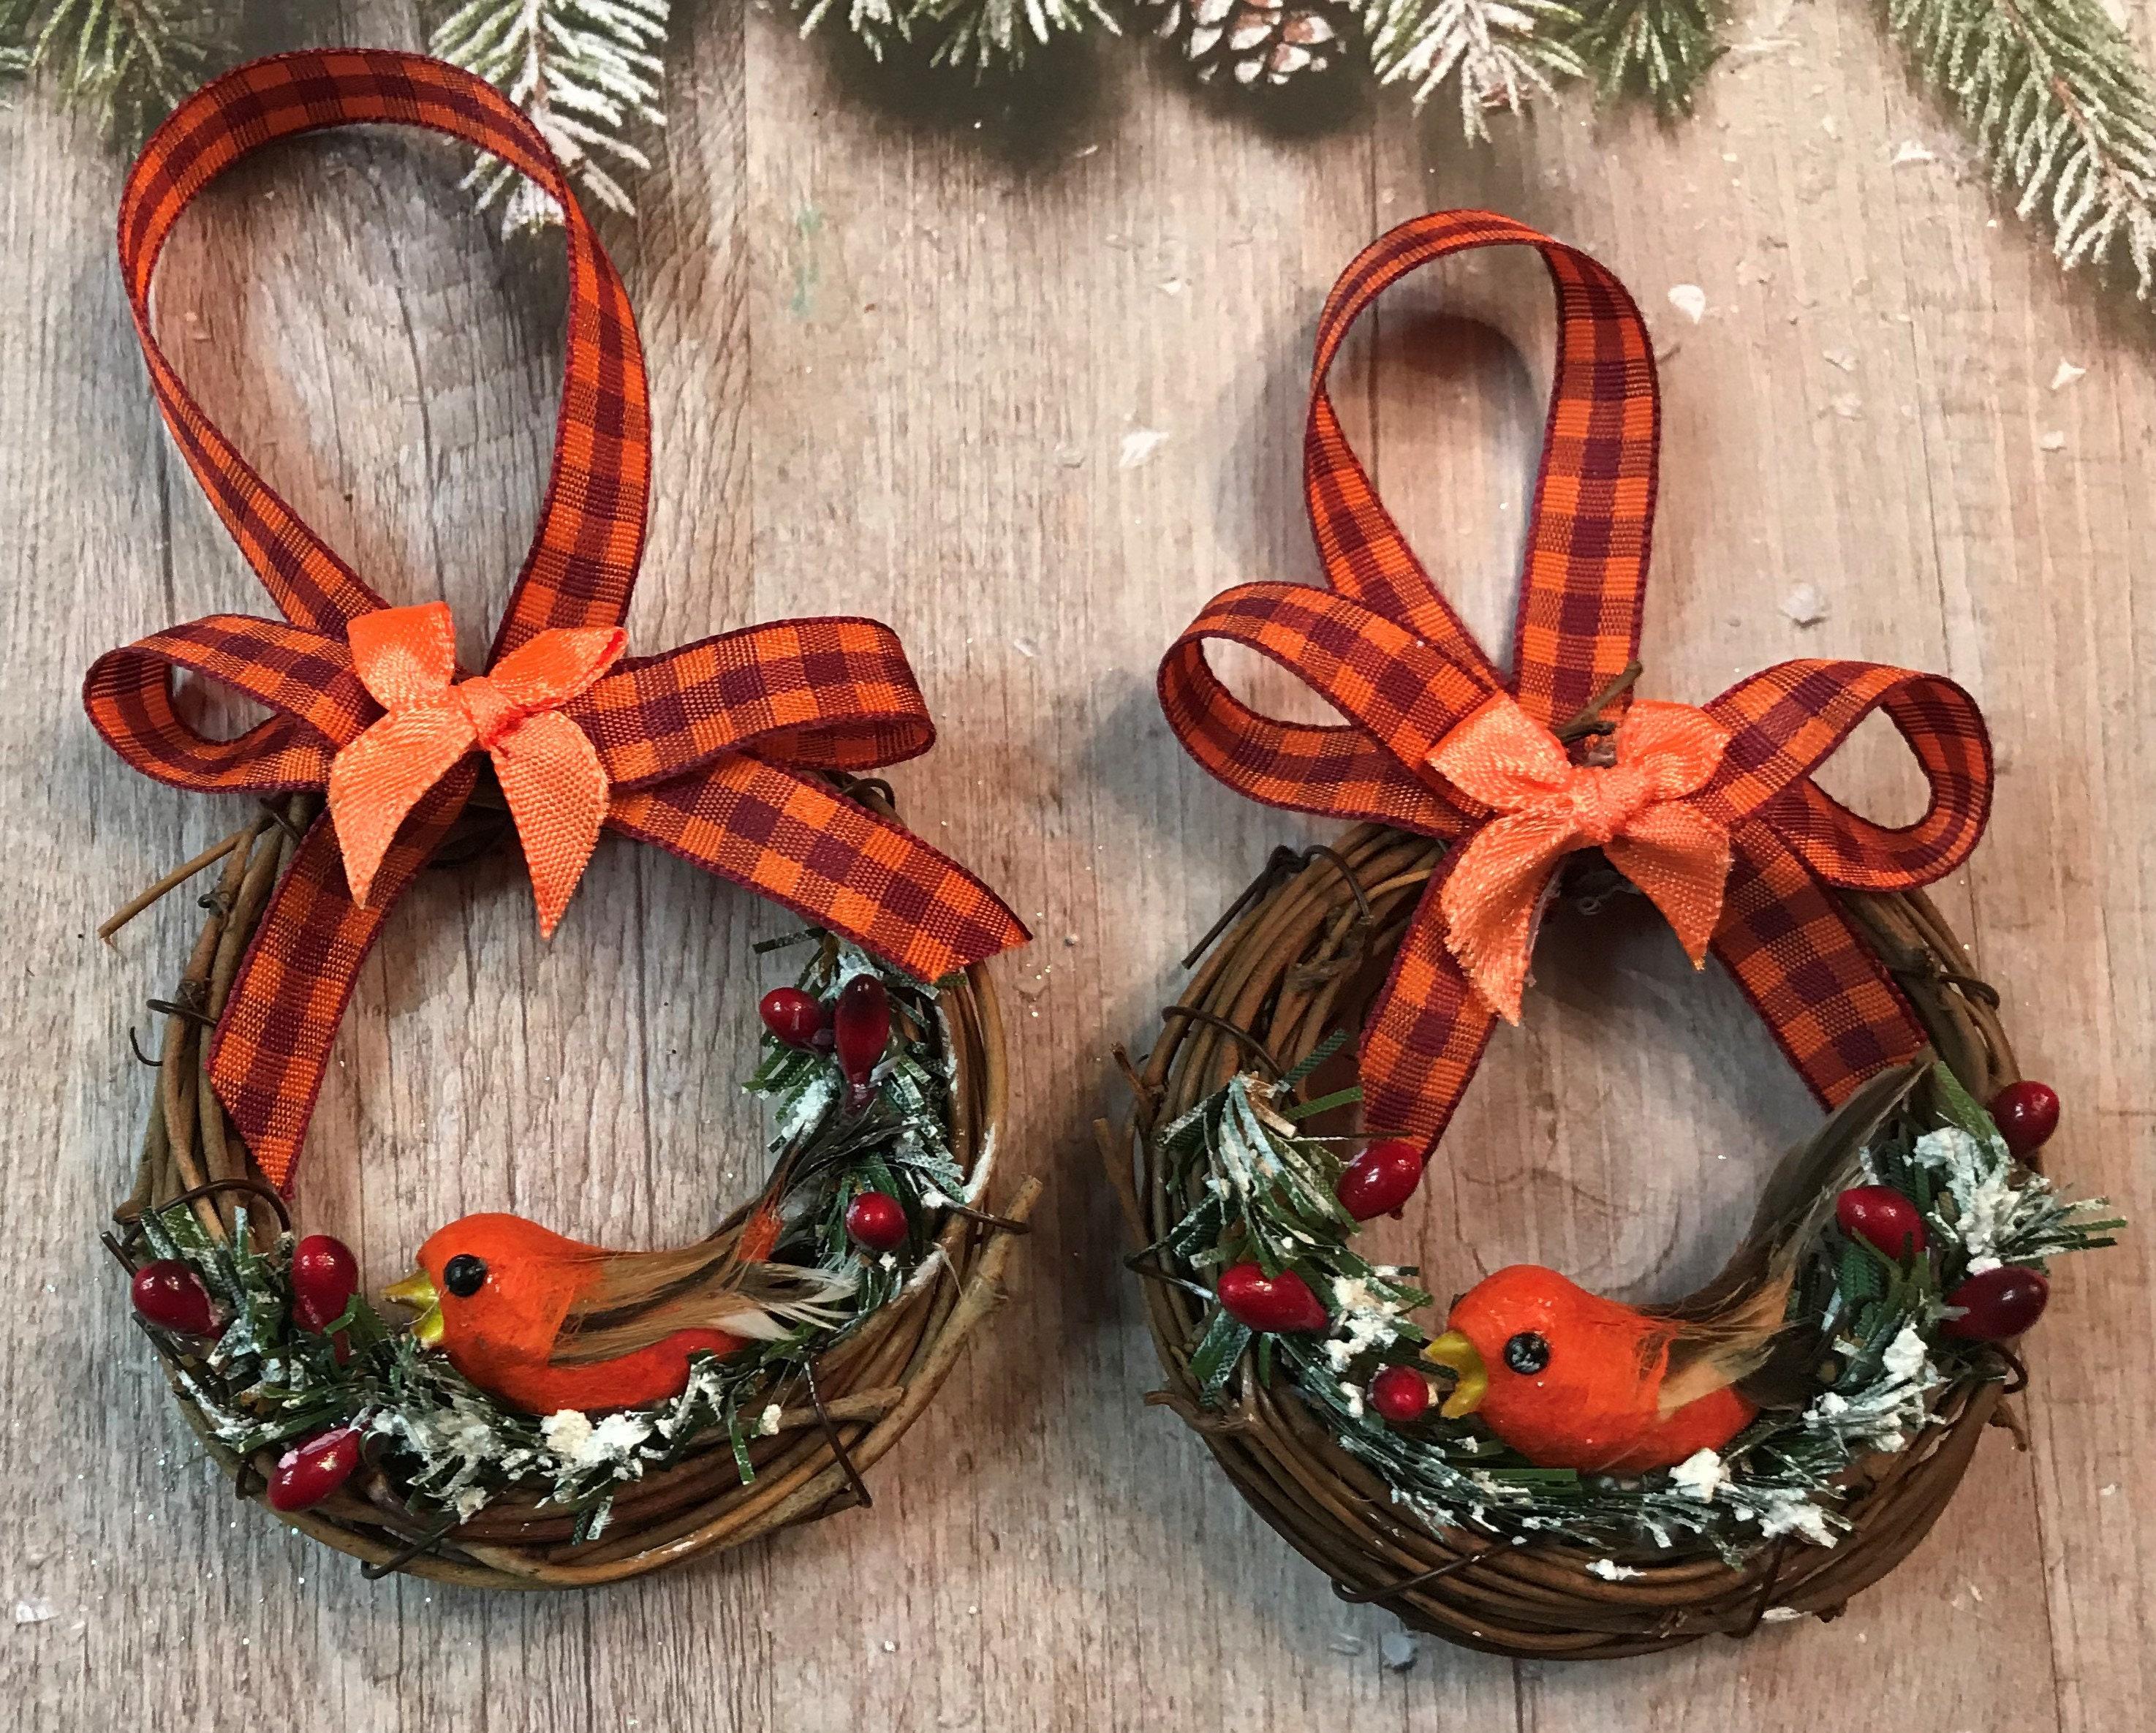 Handmade Christmas Ornaments Country Christmas Ornaments ...